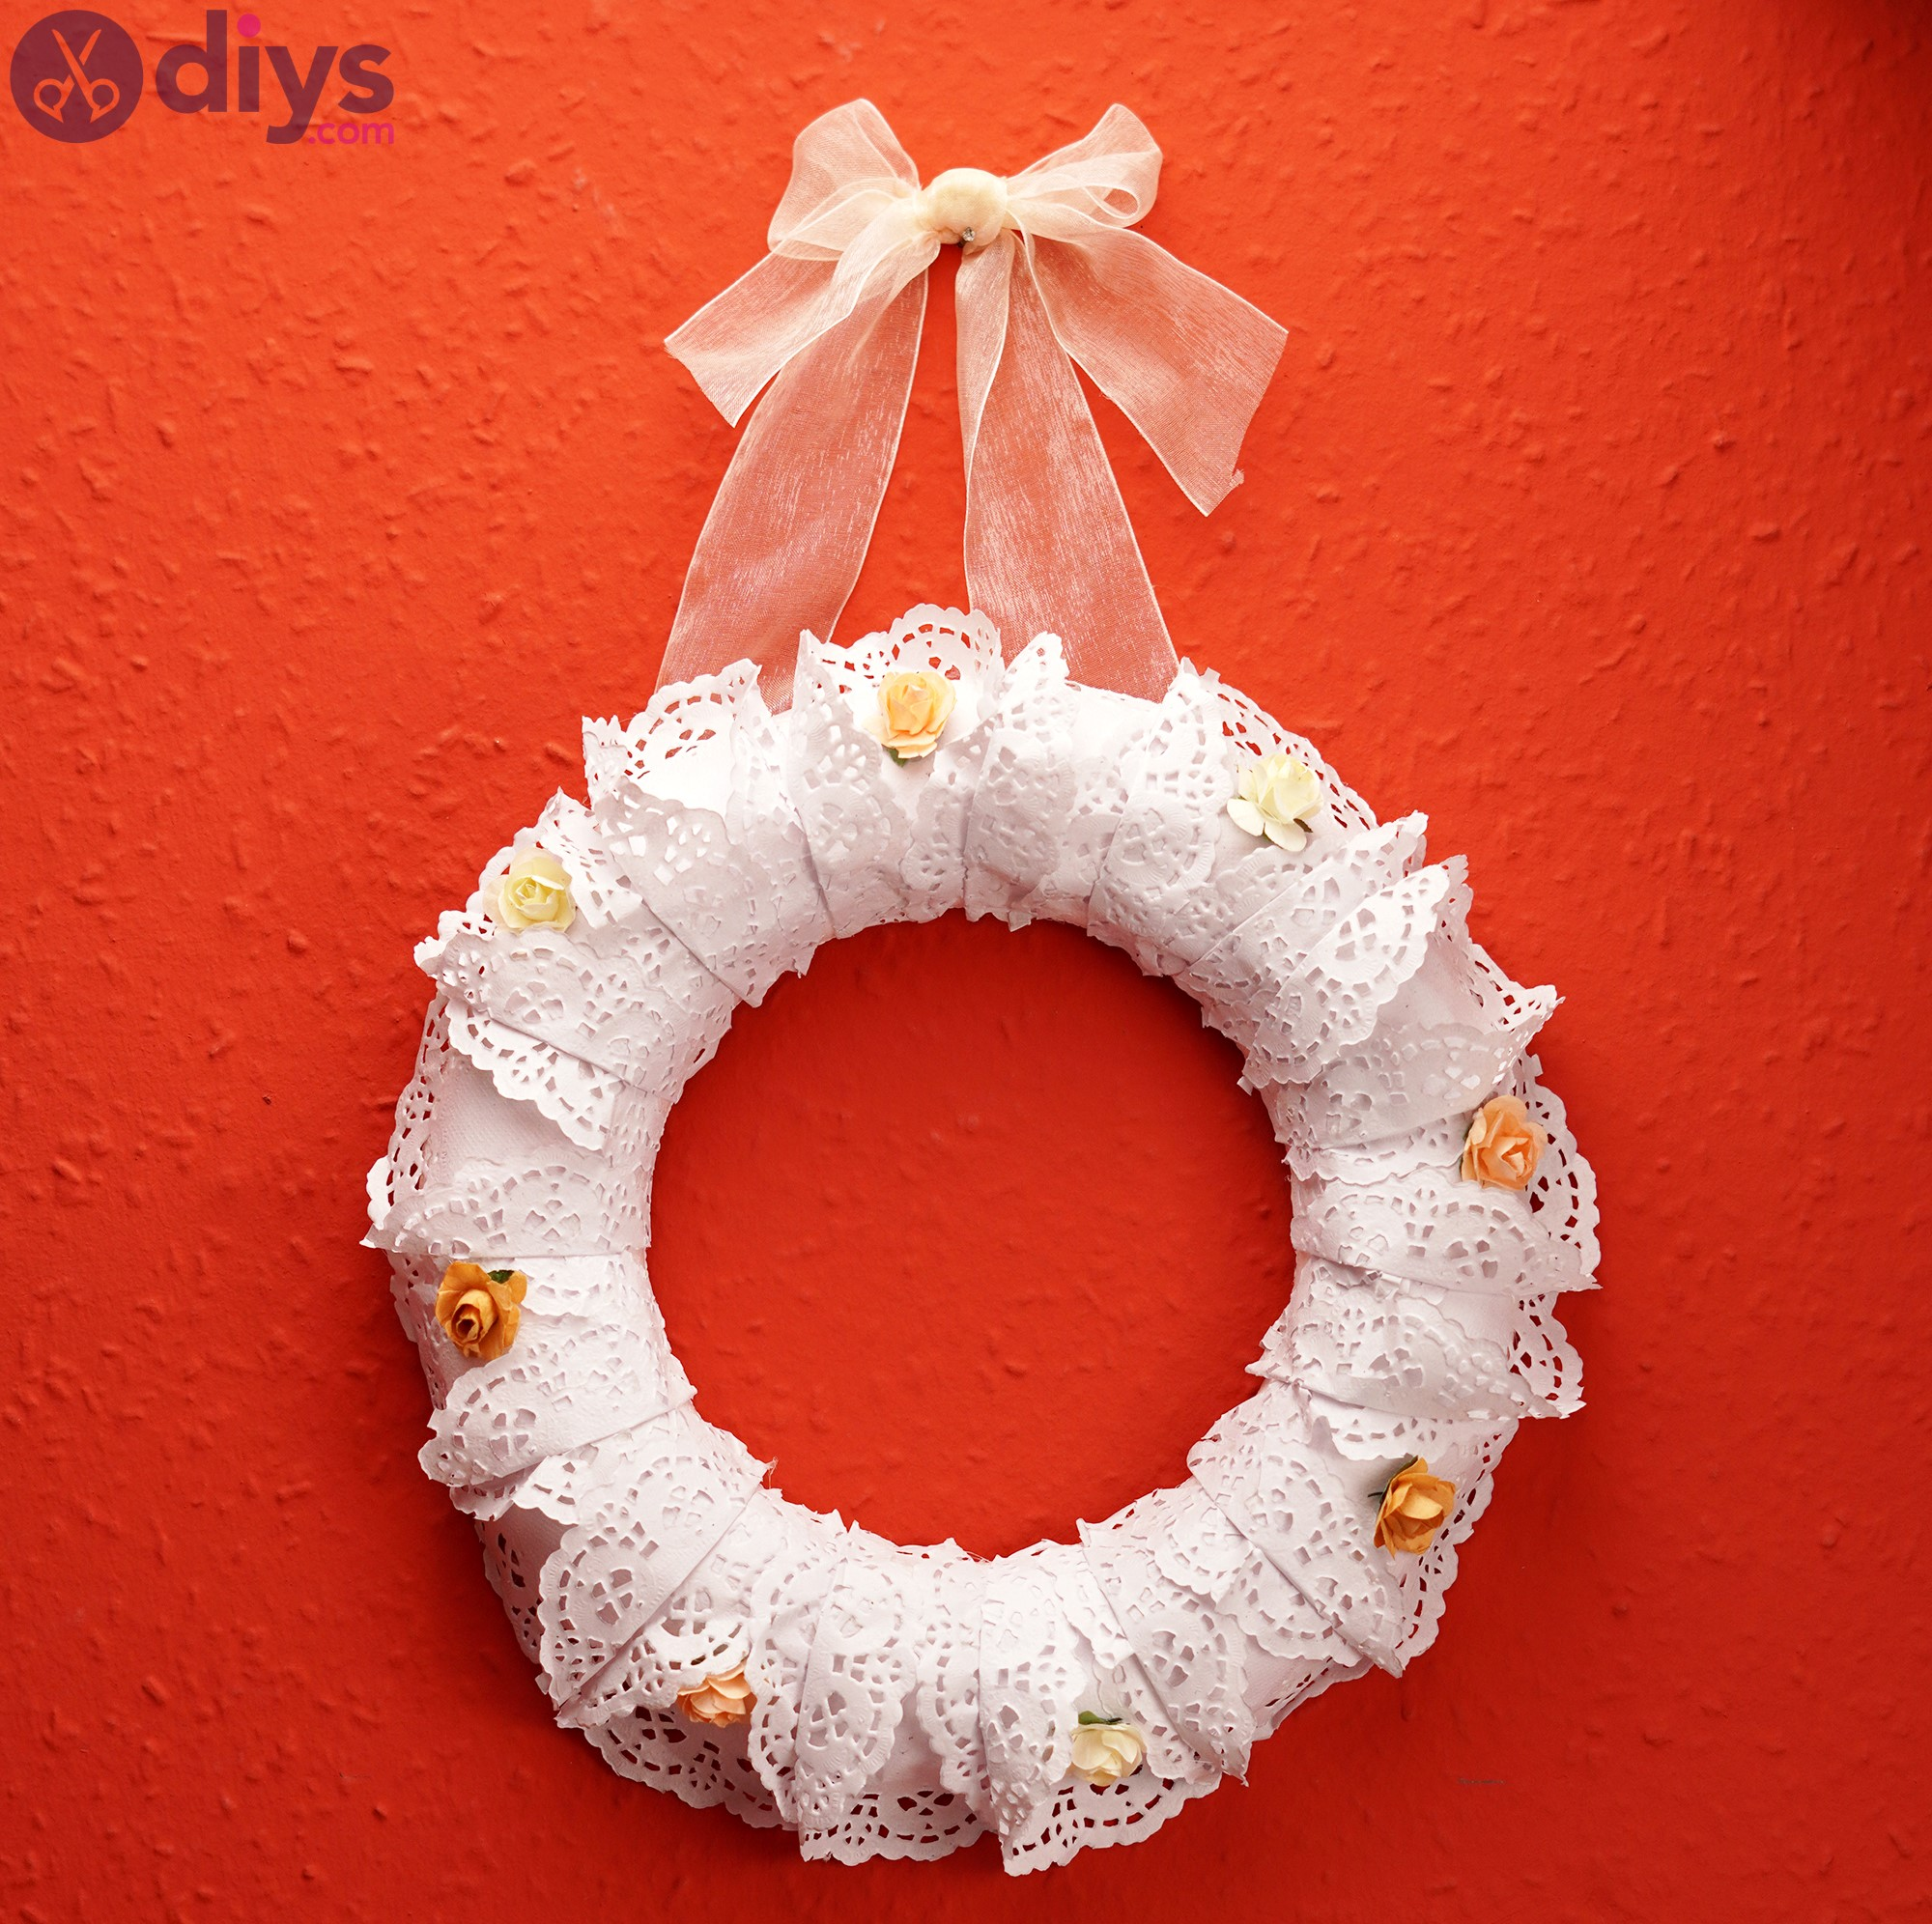 Doily wreath pics (8)